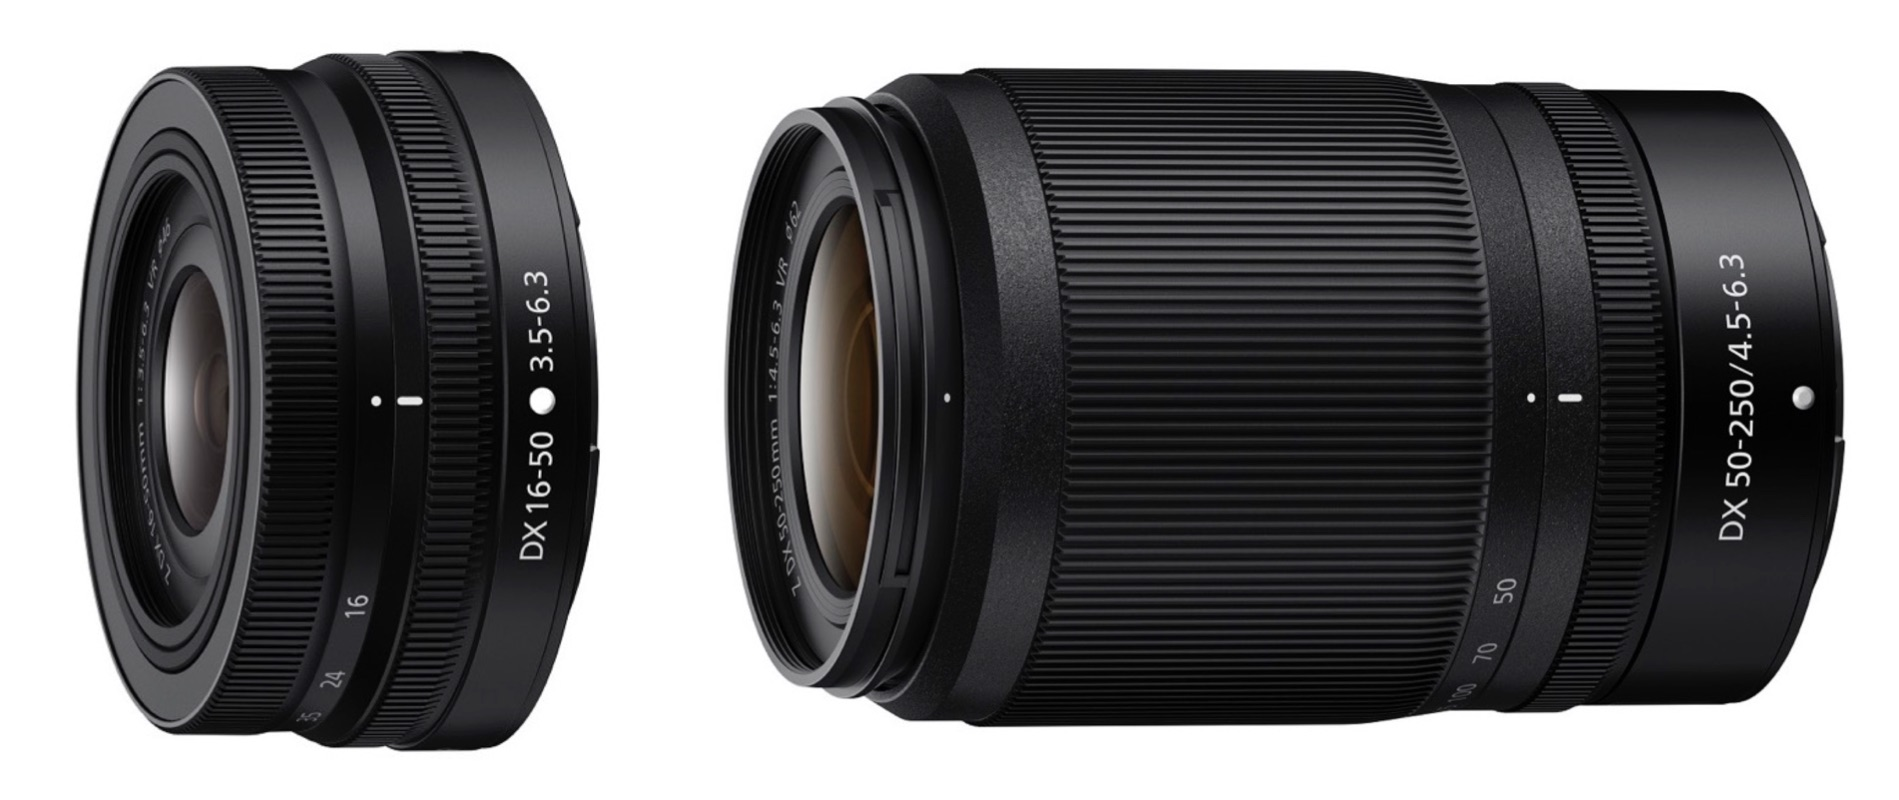 Nikon Z 50, la prima mirrorless APS-C della serie Z